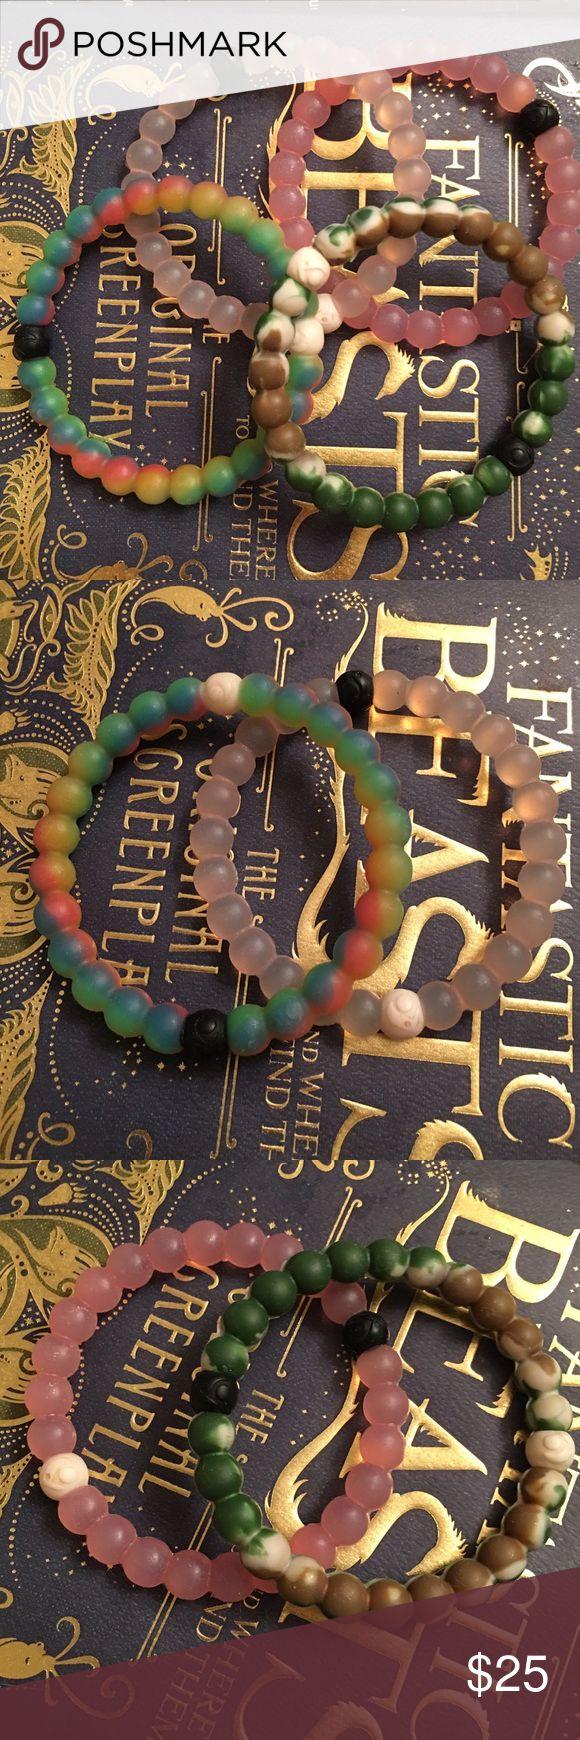 Lokai Bracelets Three worn Lokai bracelets. Good condition clear, pink and camouflage. Size Medium Lokai Jewelry Bracelets